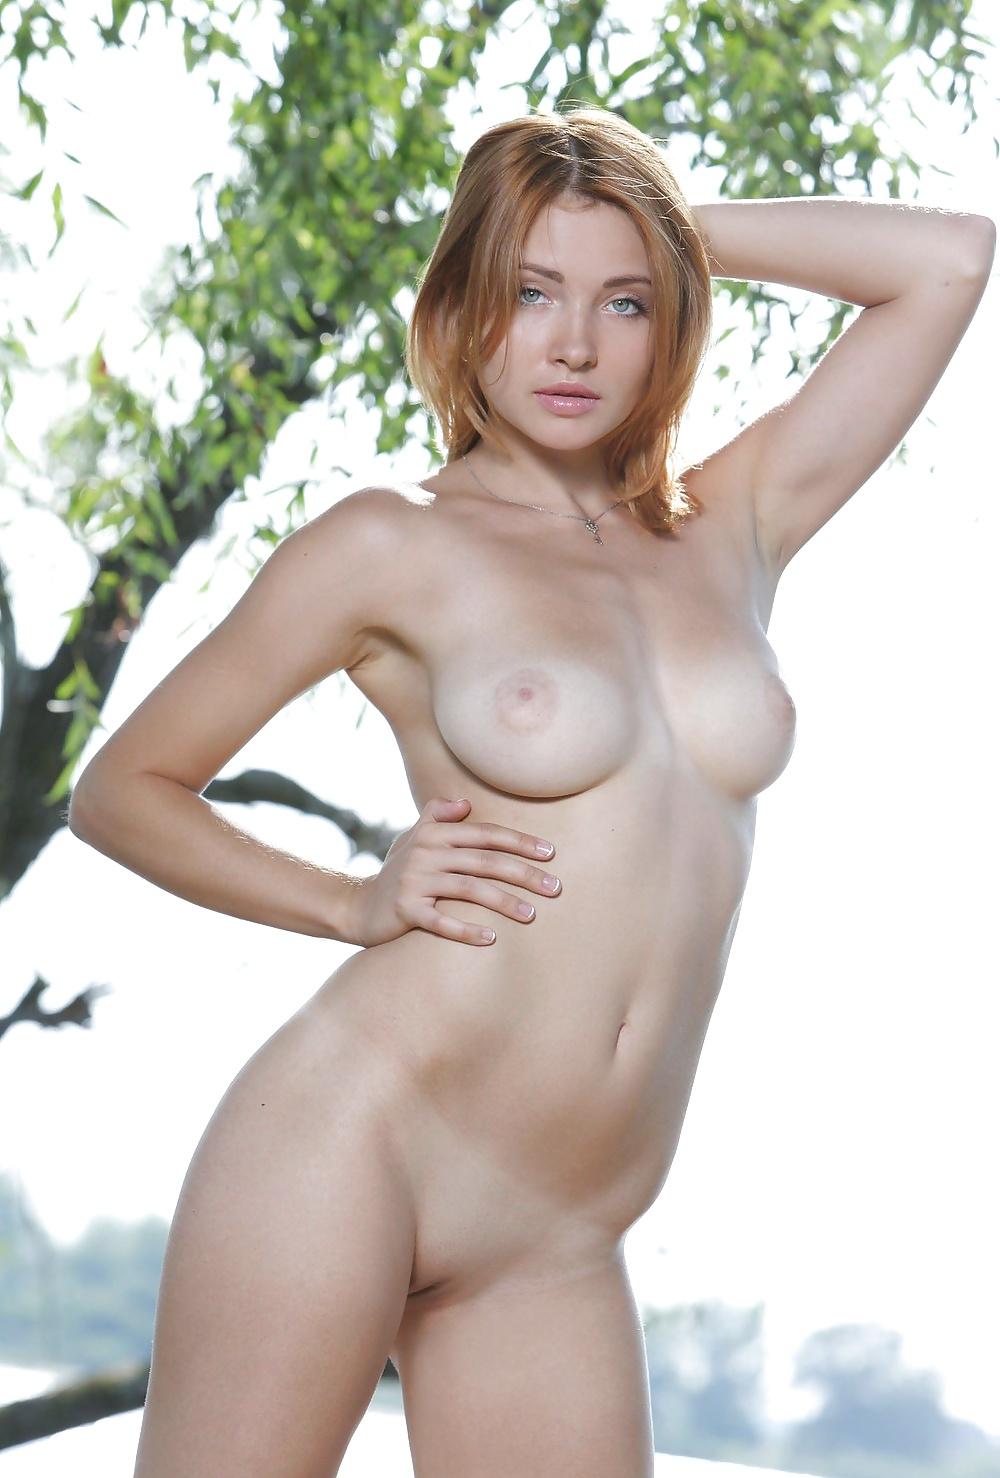 Hübsche bare Mädels in gratis Bildern